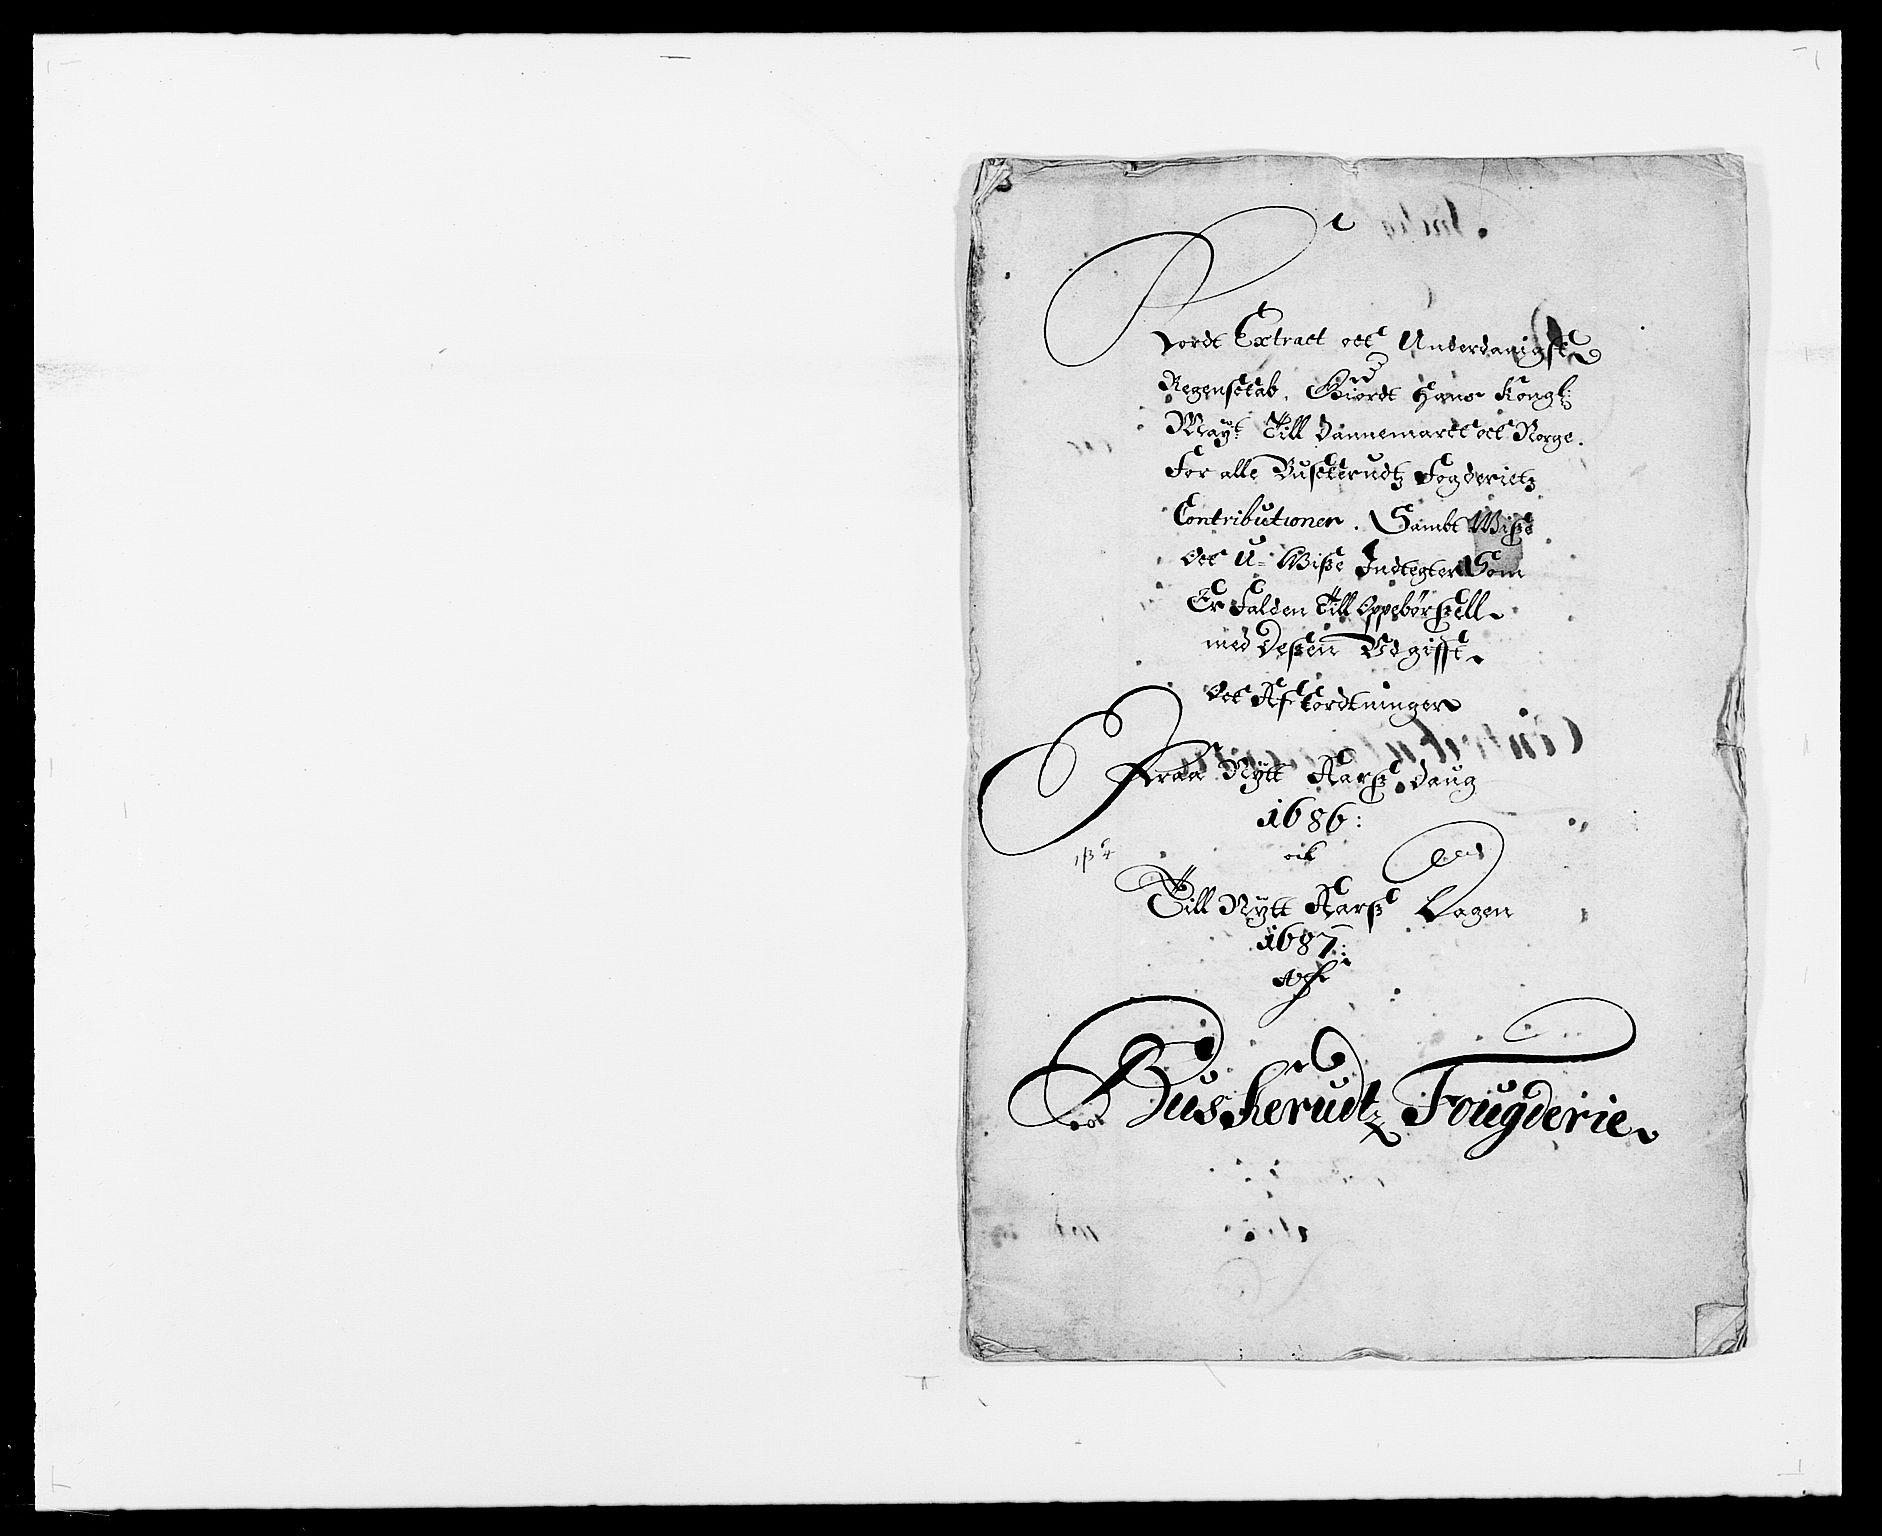 RA, Rentekammeret inntil 1814, Reviderte regnskaper, Fogderegnskap, R25/L1678: Fogderegnskap Buskerud, 1685-1686, s. 222